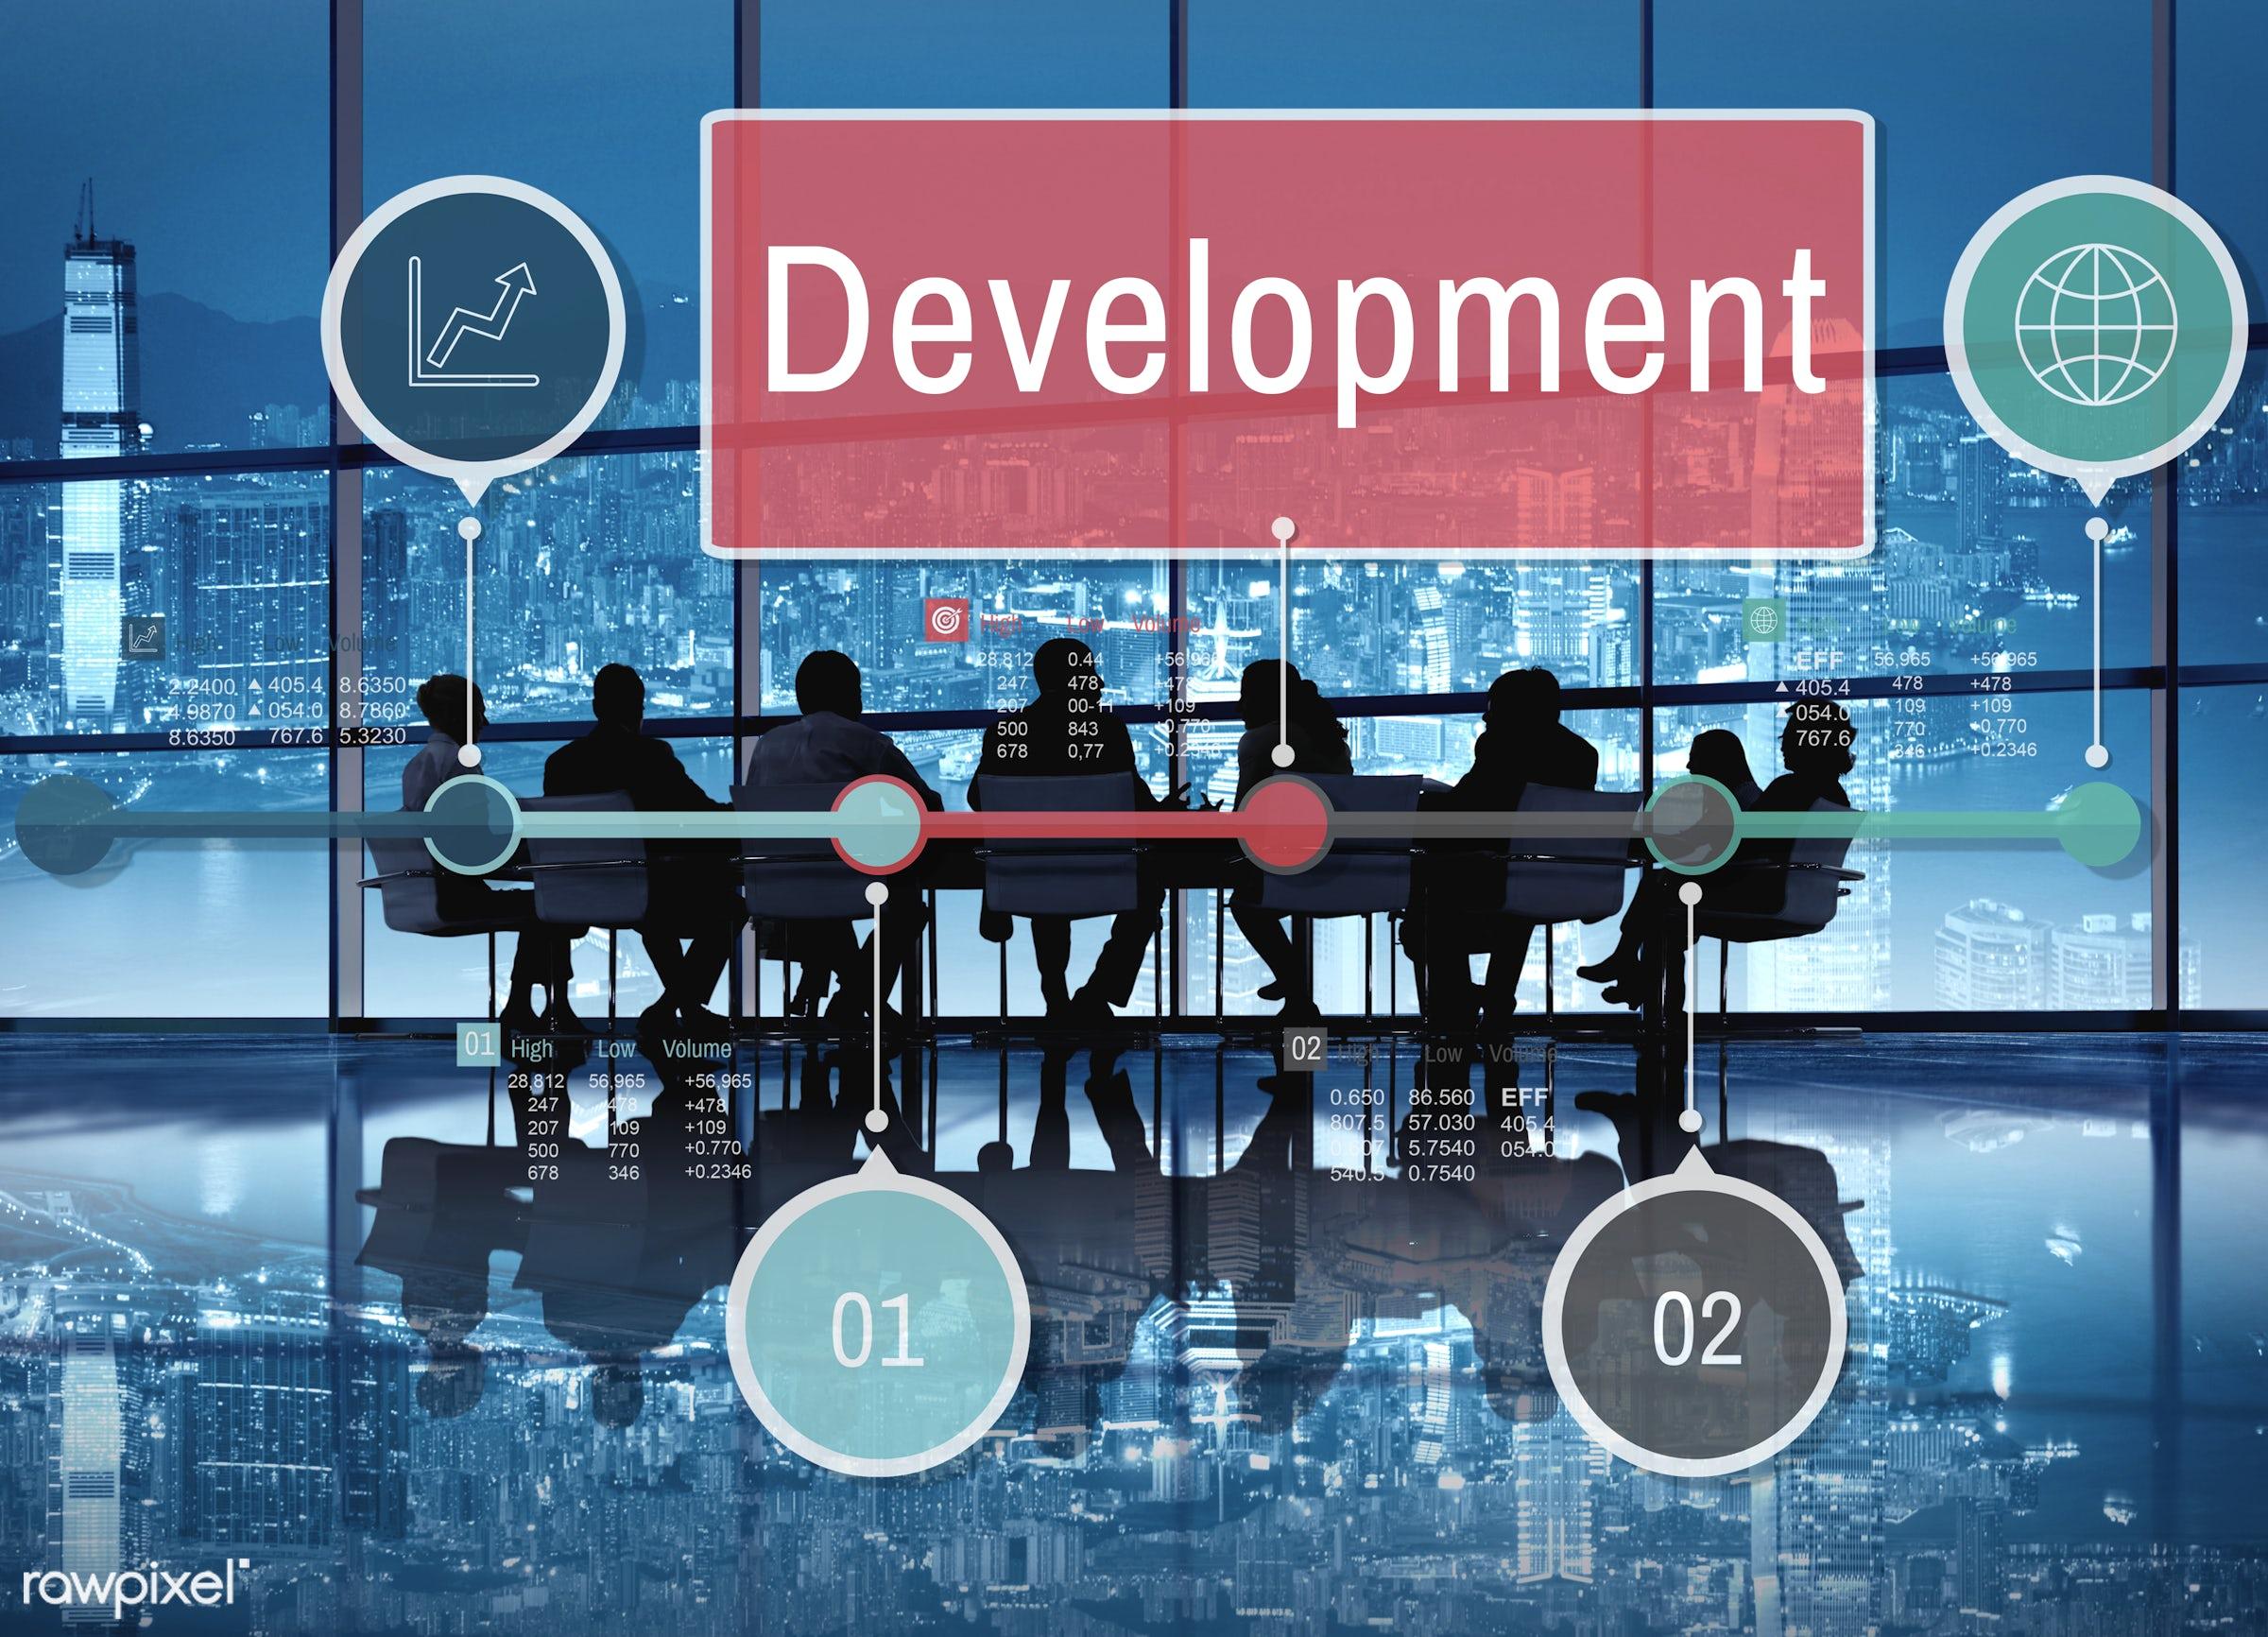 development, achievement, advance, analysis, arrow, building, buildup, business, business people, businessmen, businesswomen...